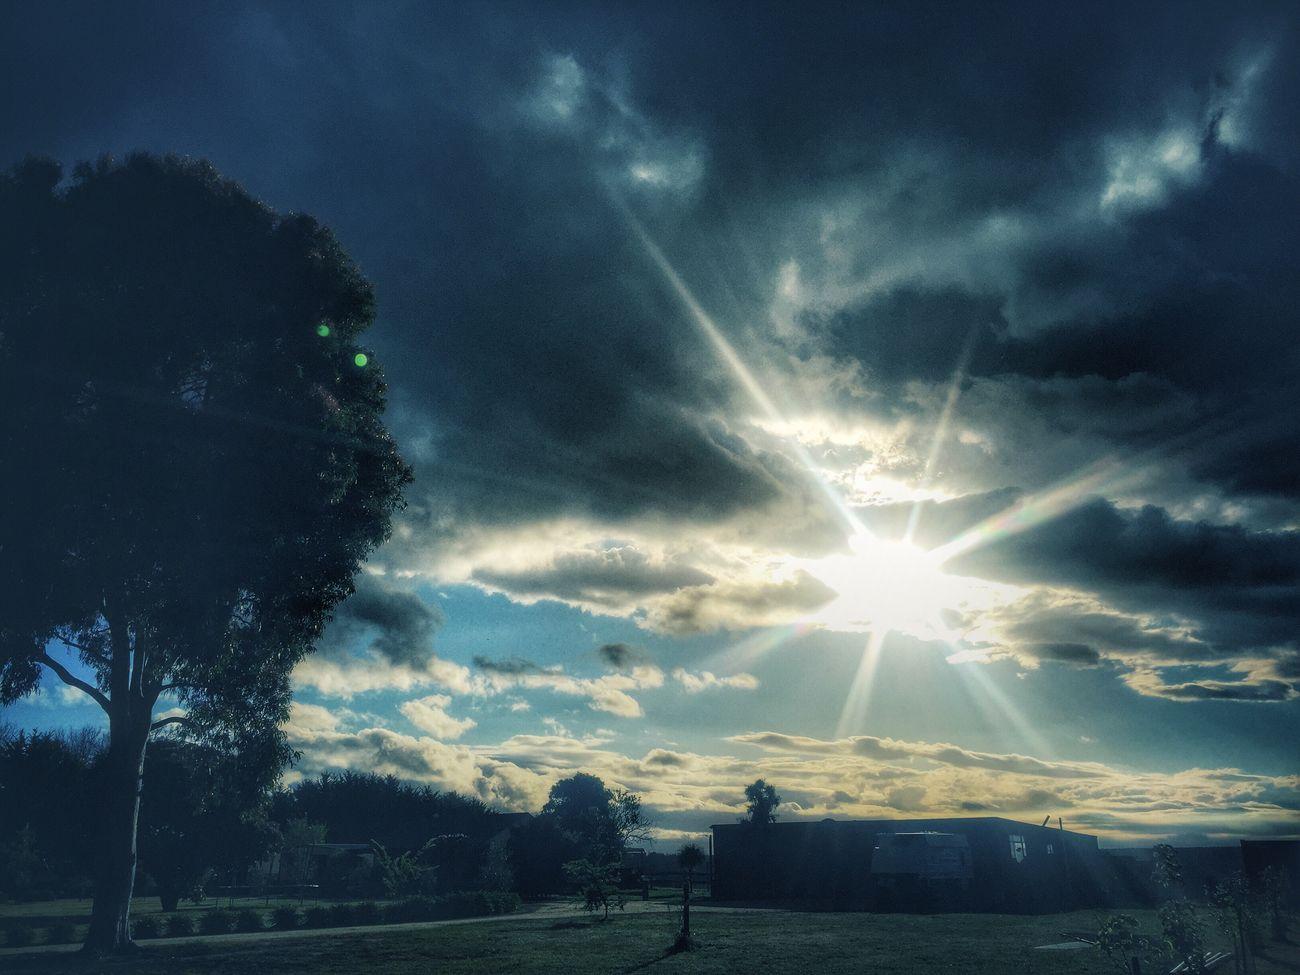 Home sweet home Sky Sunbeam Lens Flare Sunlight Tree Cloud - Sky Nature Landscape Tranquil Scene Outdoors Sunset Beauty In Nature Sunset #sun #clouds #skylovers #sky #nature #beautifulinnature #naturalbeauty #photography #landscape Rural Scene EyeEm Best Edits Non-urban Scene Australian Landscape Iphoneonly Australia